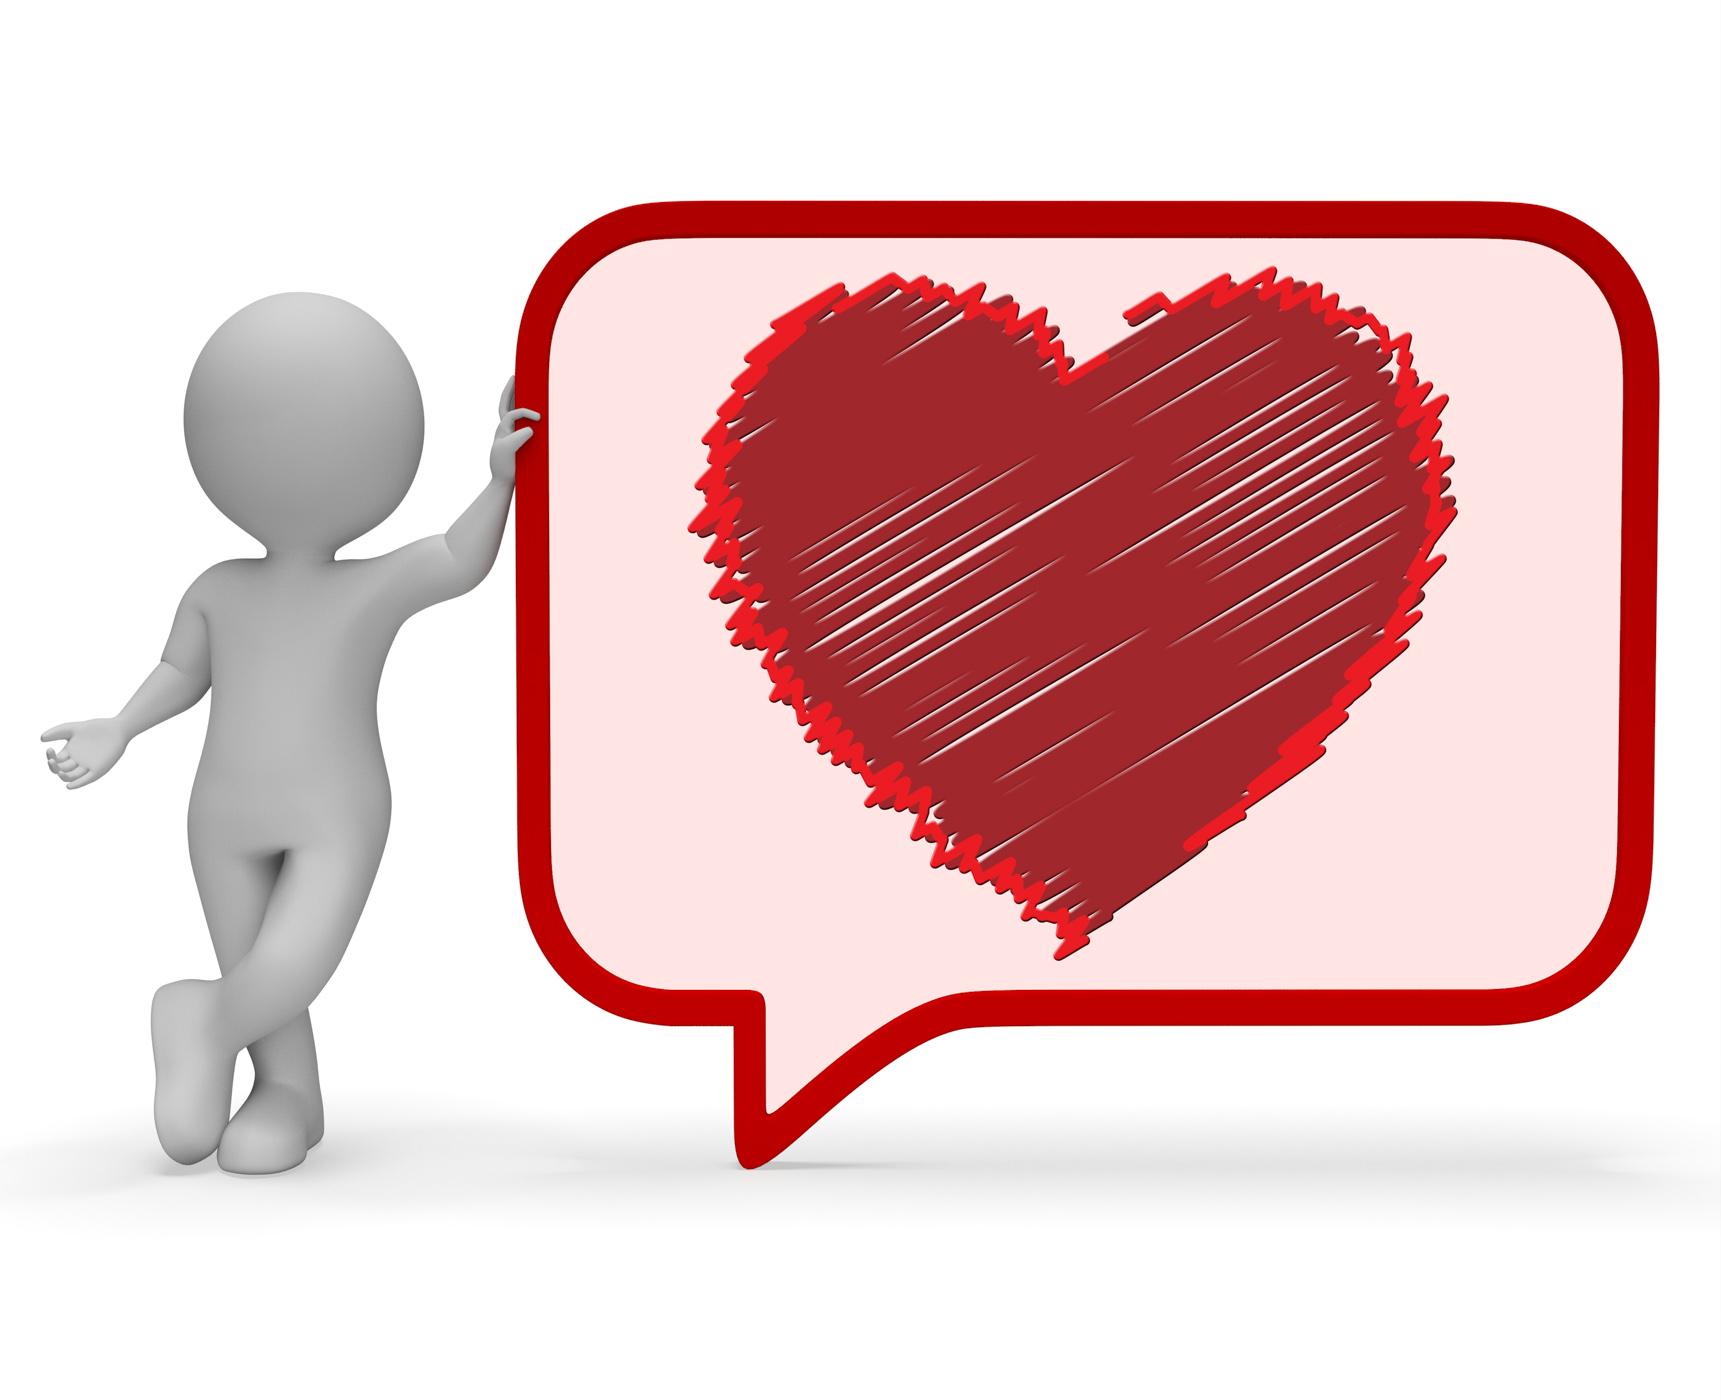 Heart Speech Bubble Means Valentines Day 3d Rendering, Relationship, Speechbubble, Speechballoon, Speech, HQ Photo